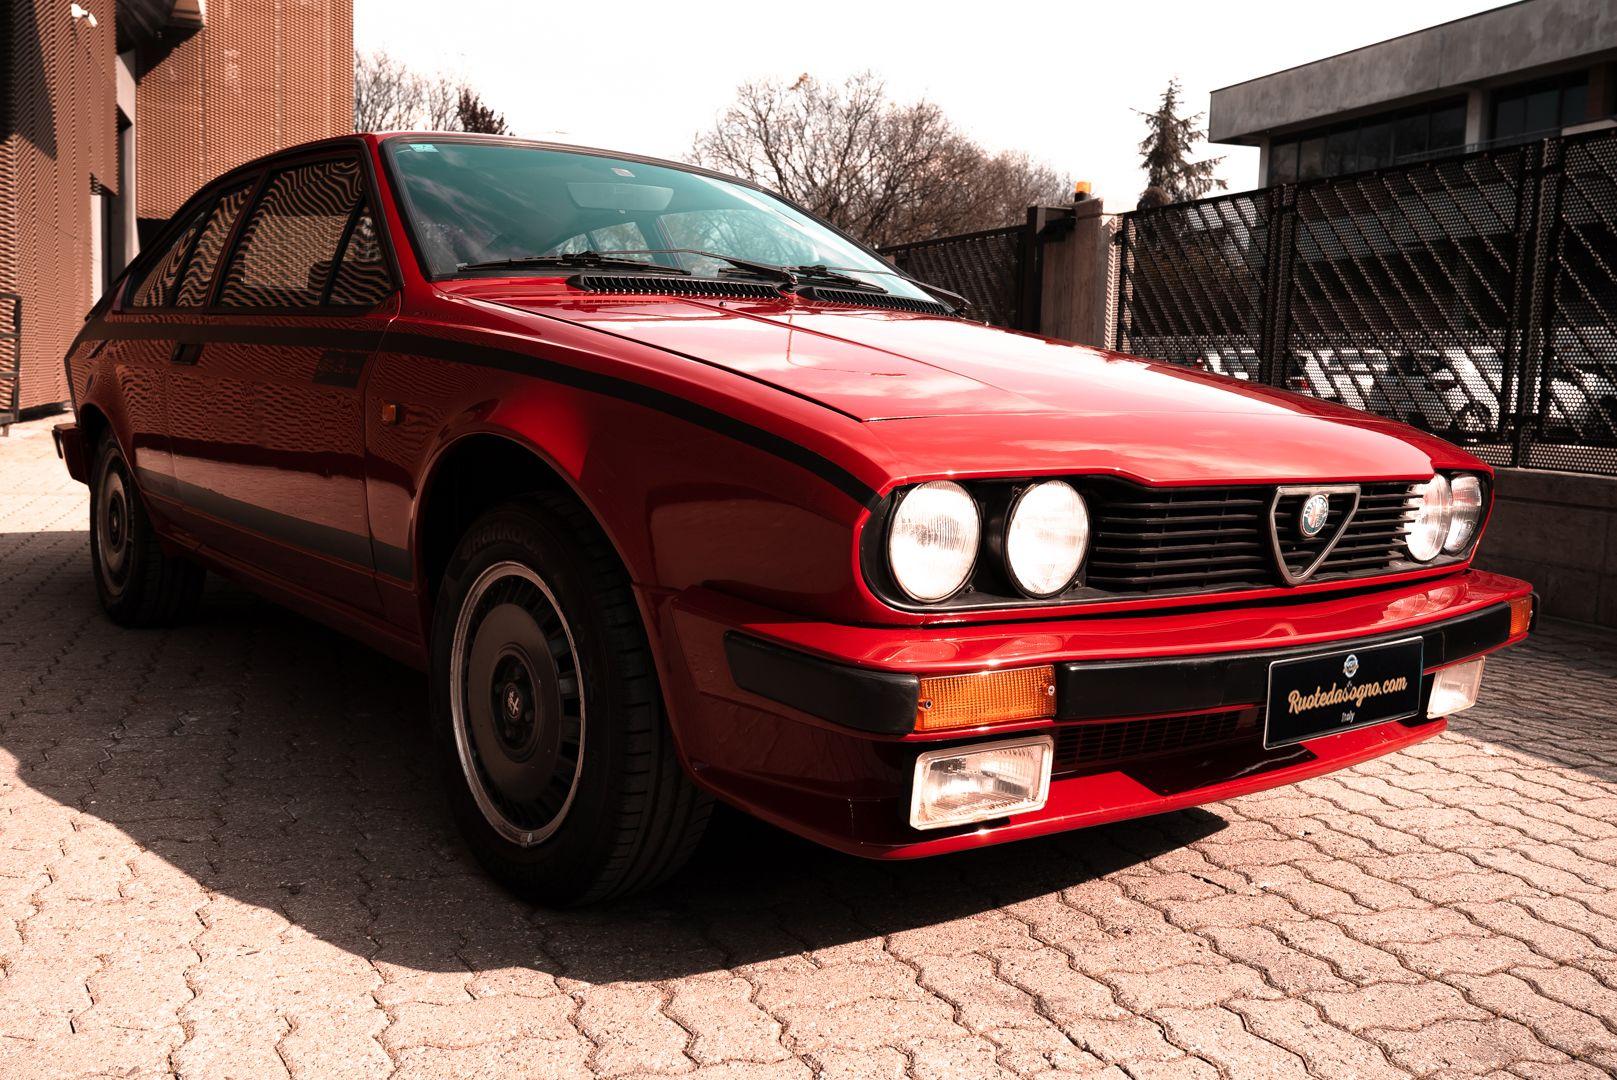 1981 Alfa Romeo Alfetta GTV Gran Prix no. 128 68555